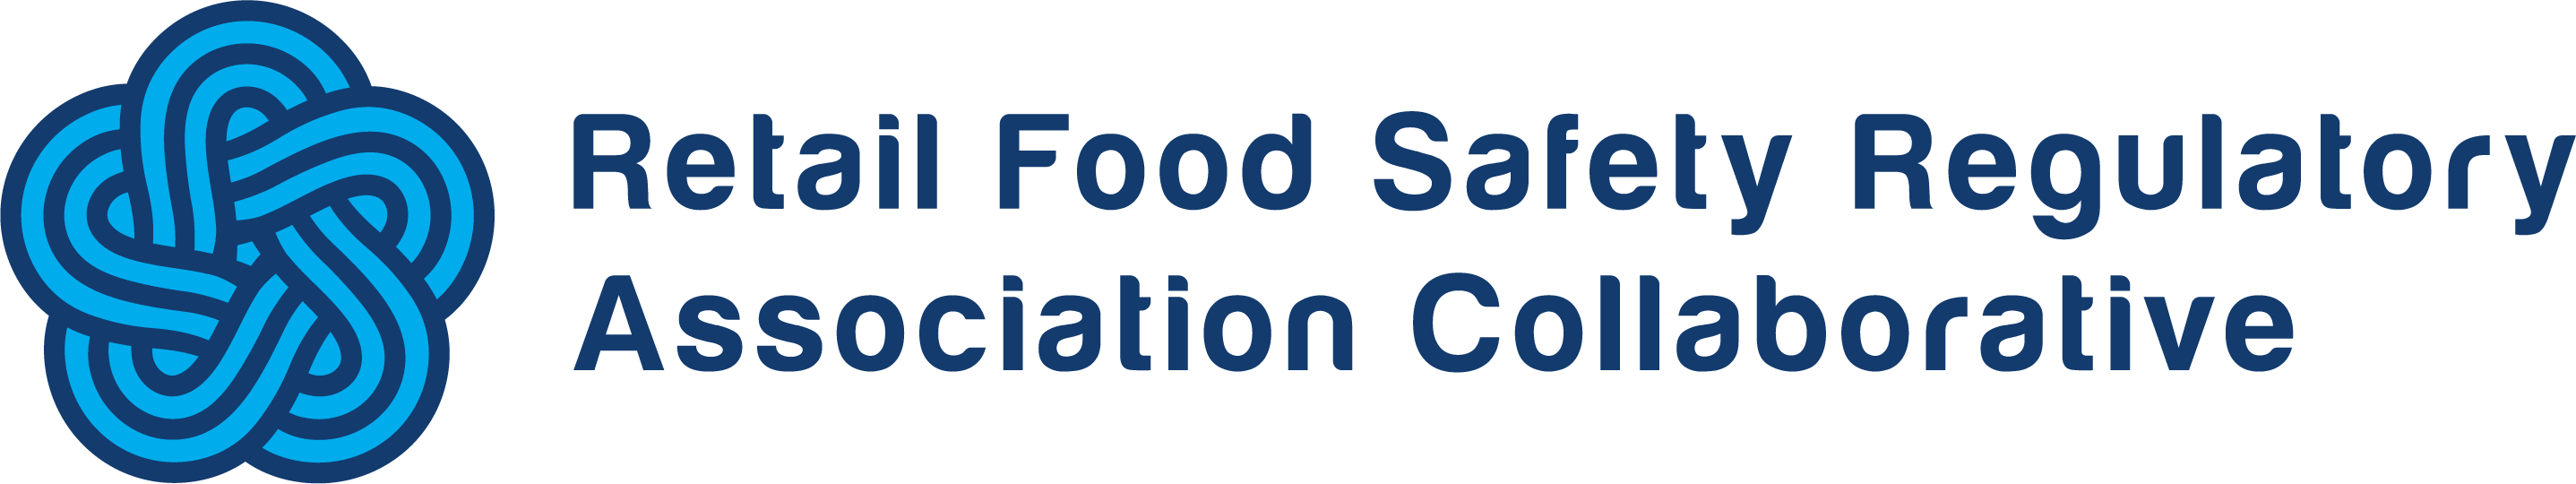 Retail Food Safety Regulatory Association Collaborative Logo